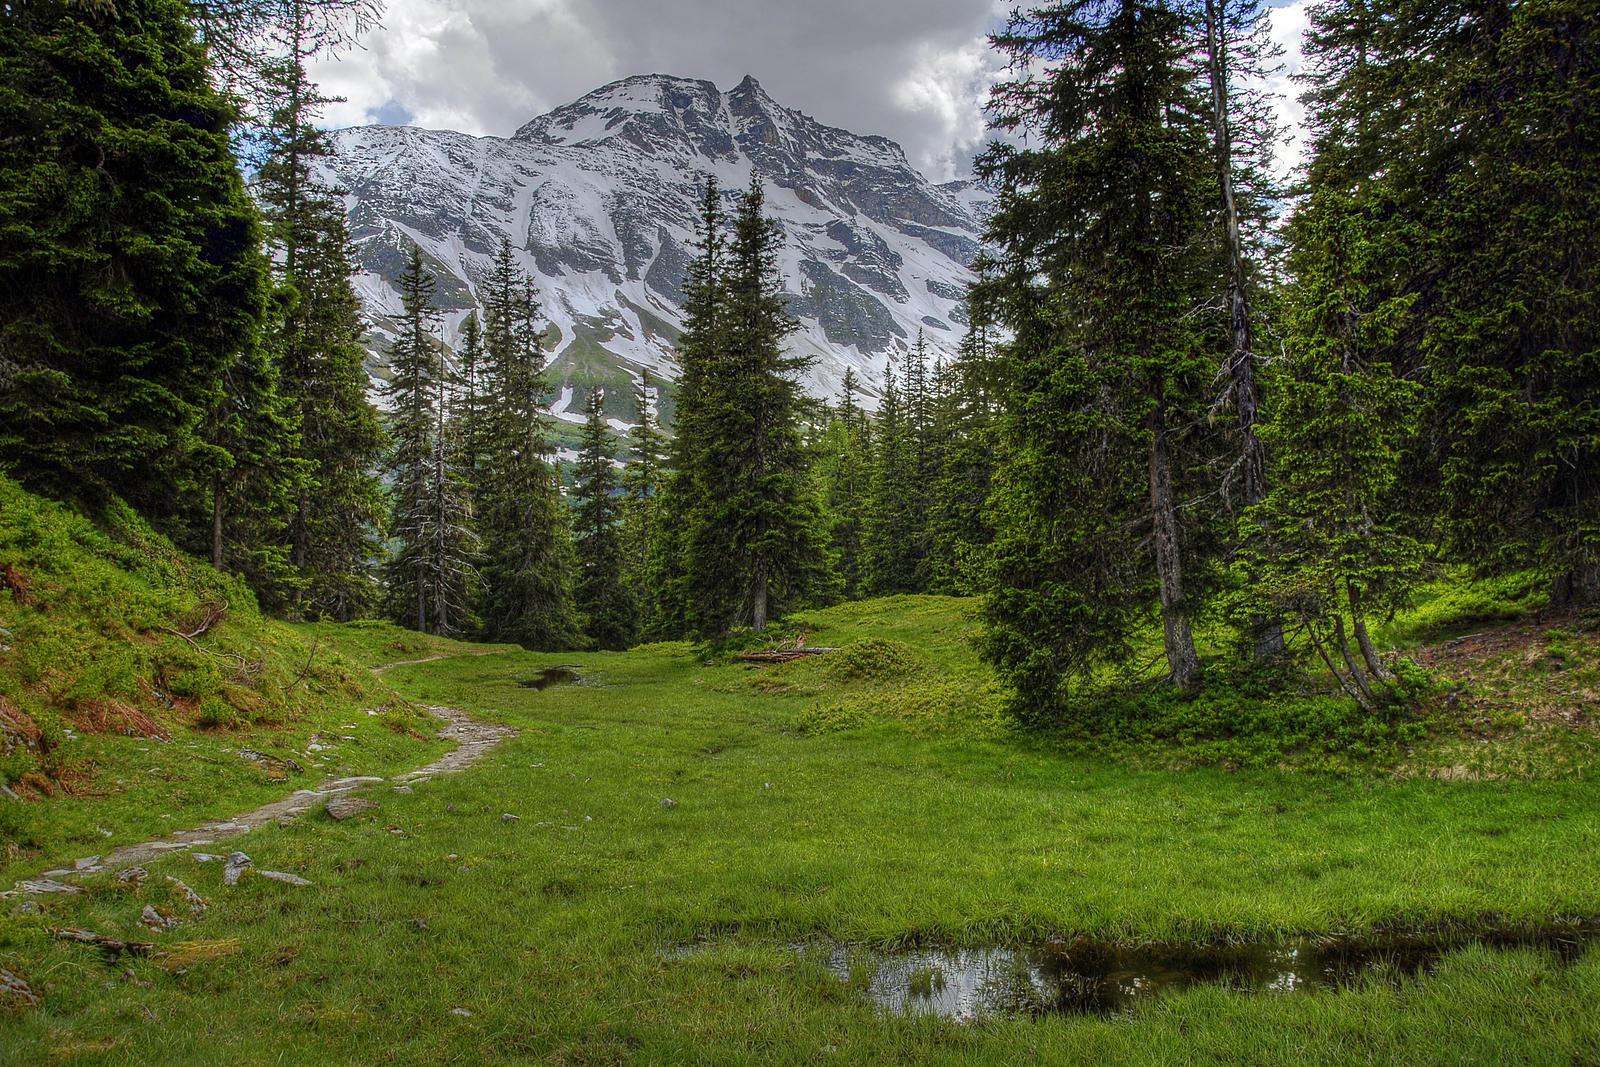 Mount Sonnblick by Burtn